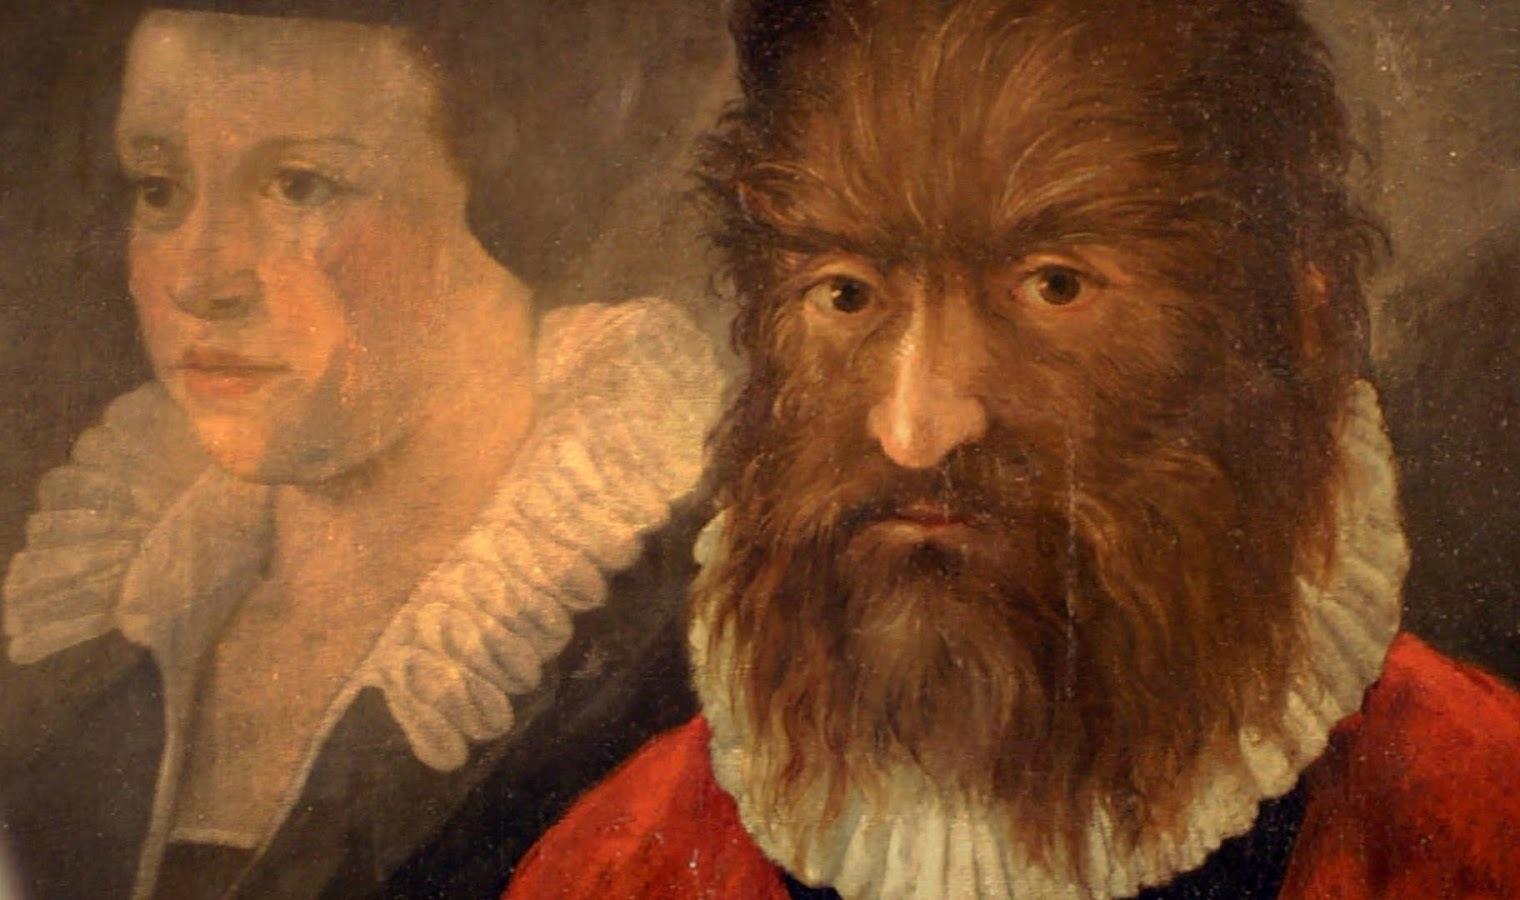 Petrus Gonsalvus e la sua sposa